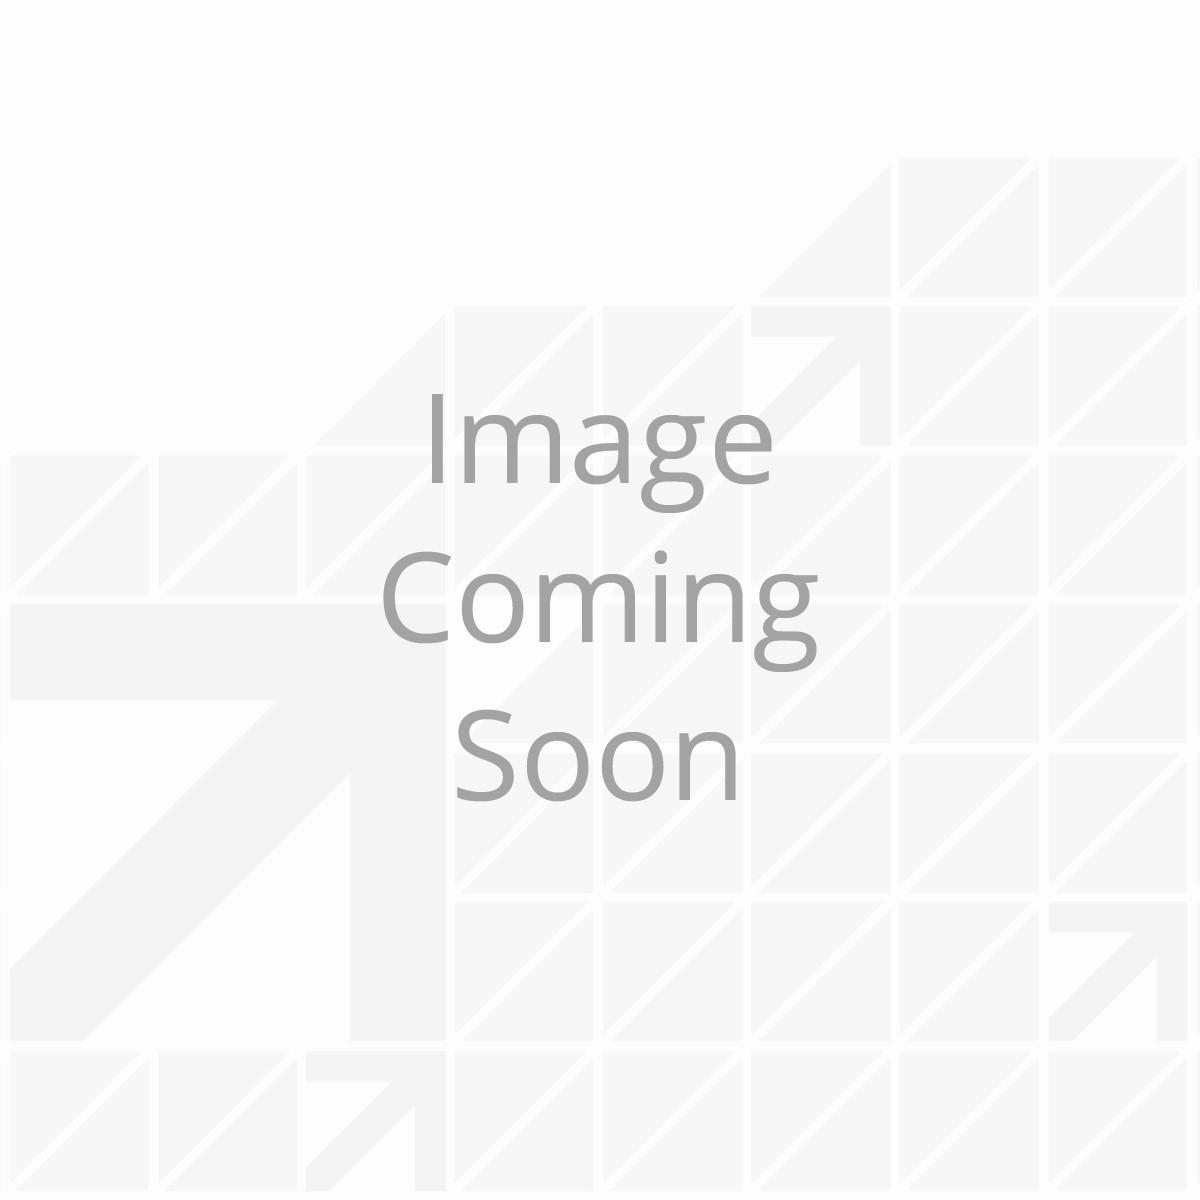 Solera® Regal Drive Head Front Cover - Various Colors